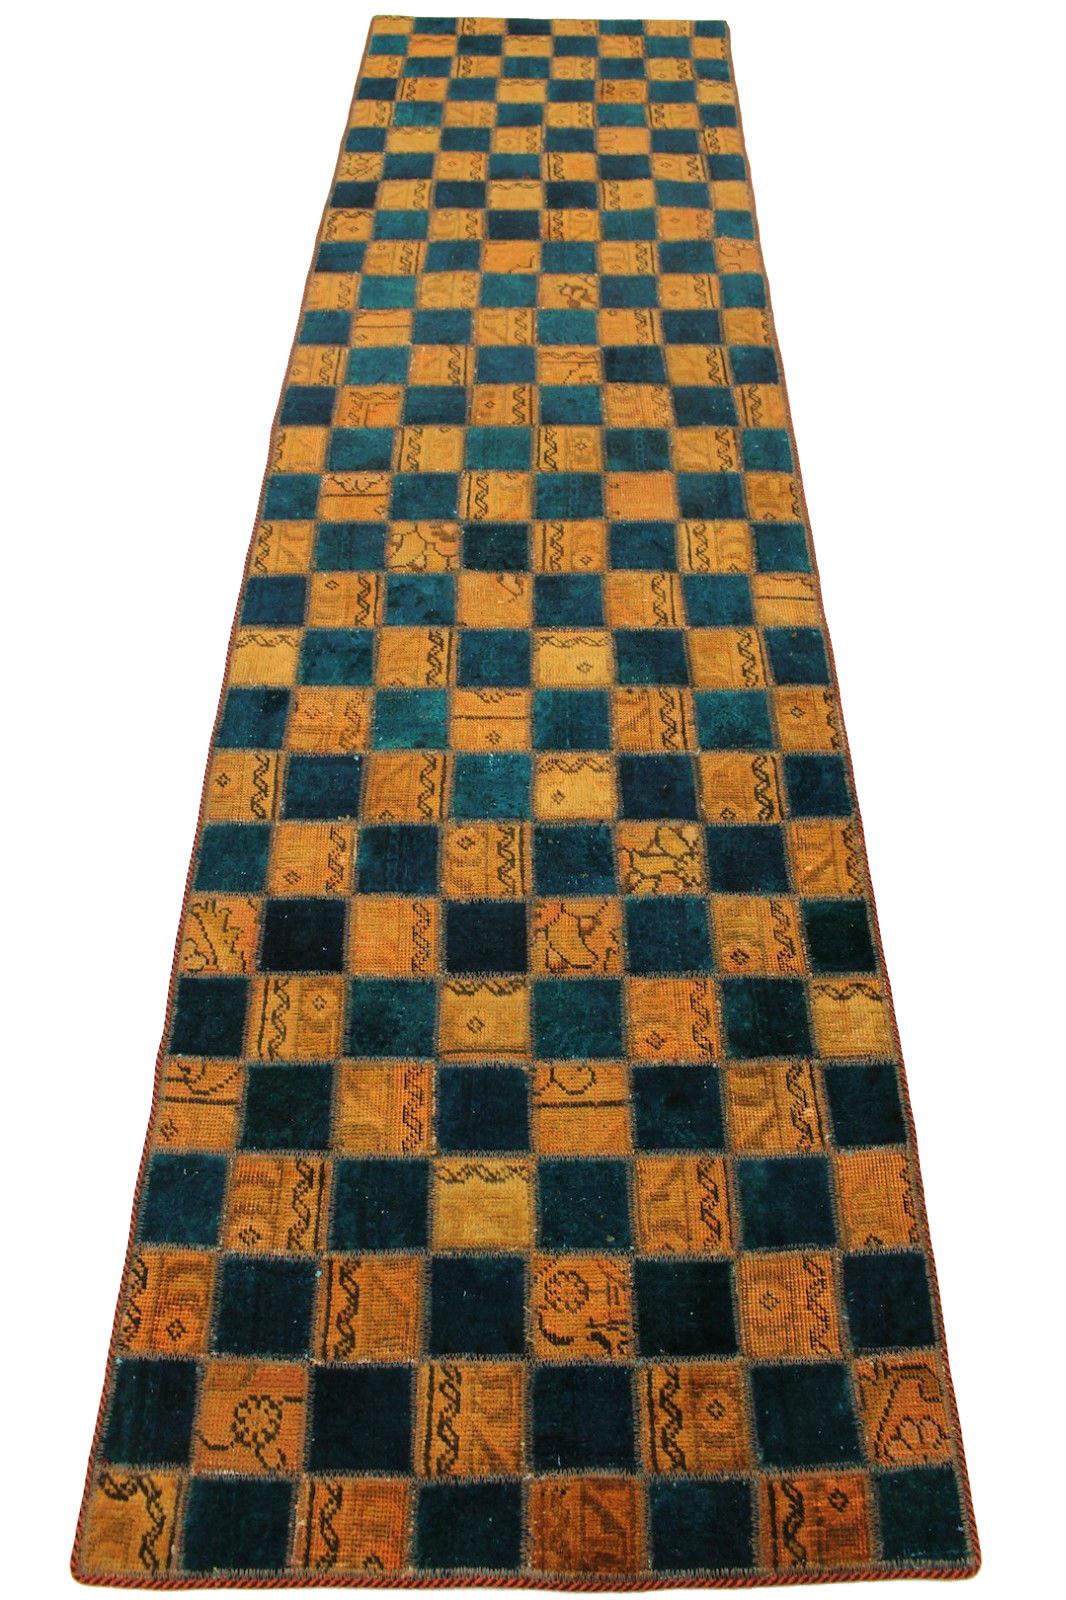 Patchwork Teppich Blau Curry in 310x80cm (10012686) bei